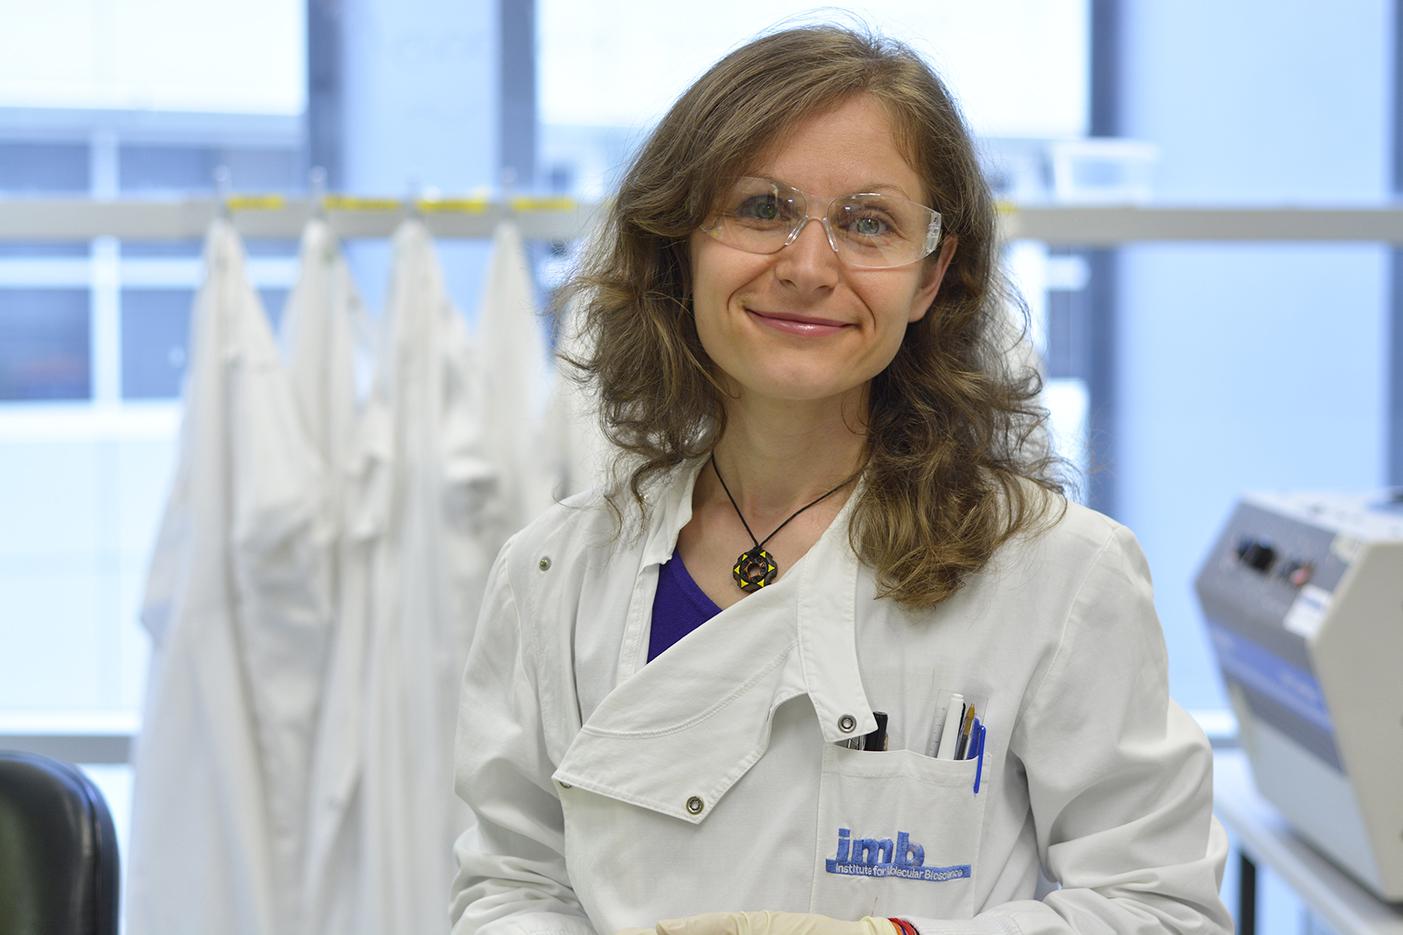 Dr Alina Zamoshnikova